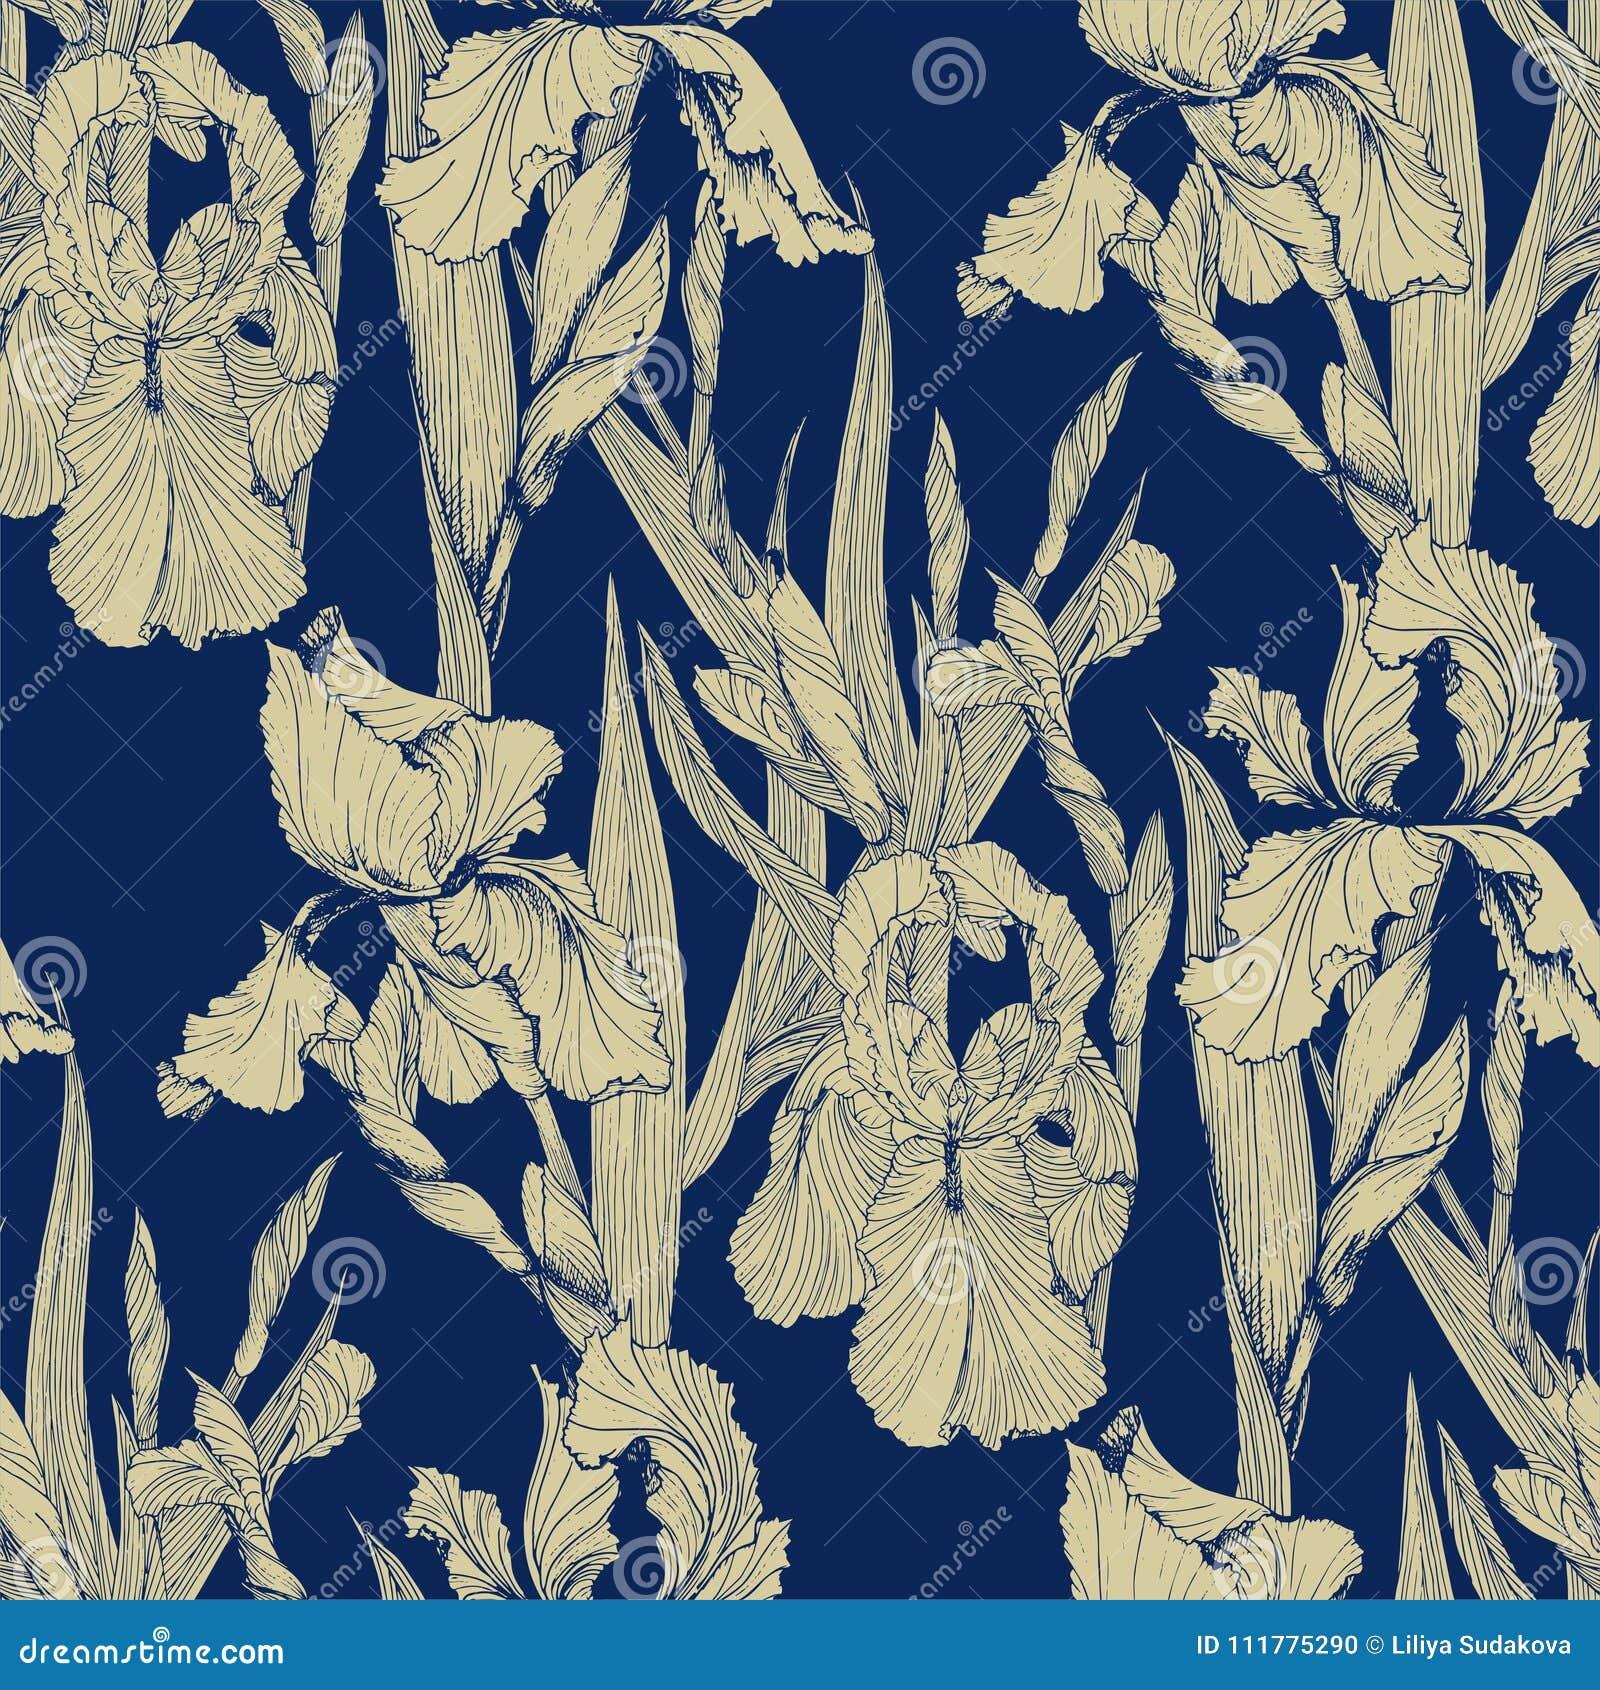 Irises flowers vector seamless pattern